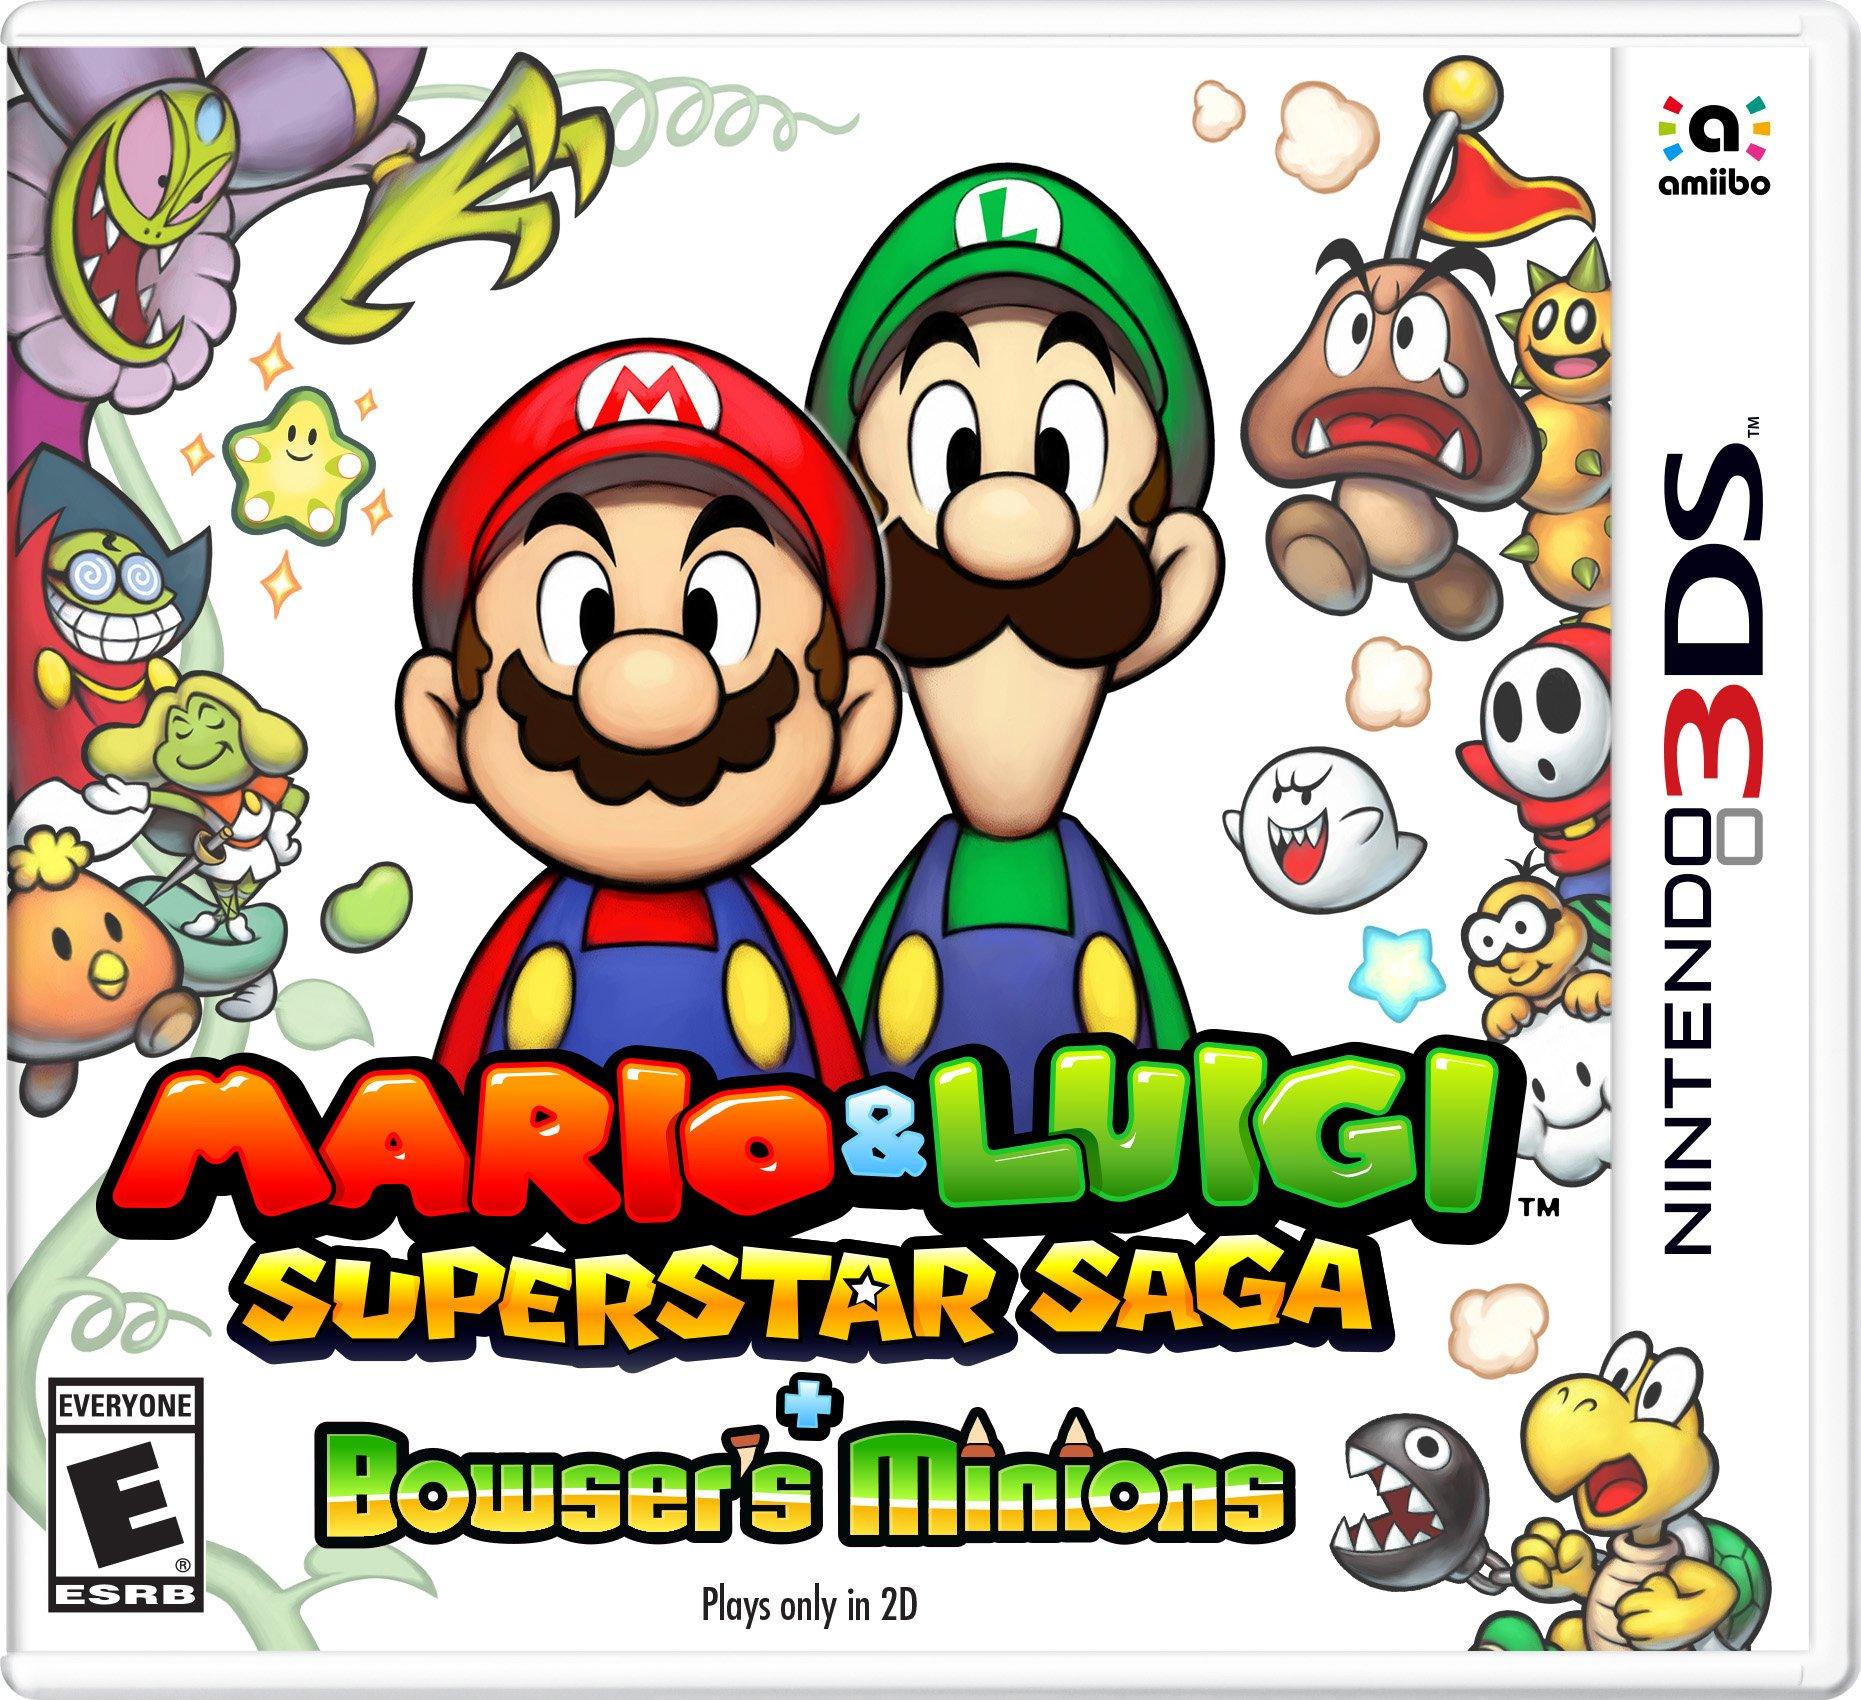 Mario & Luigi Superstar Saga + Bowser's Minions - 3DS [Digital Code]